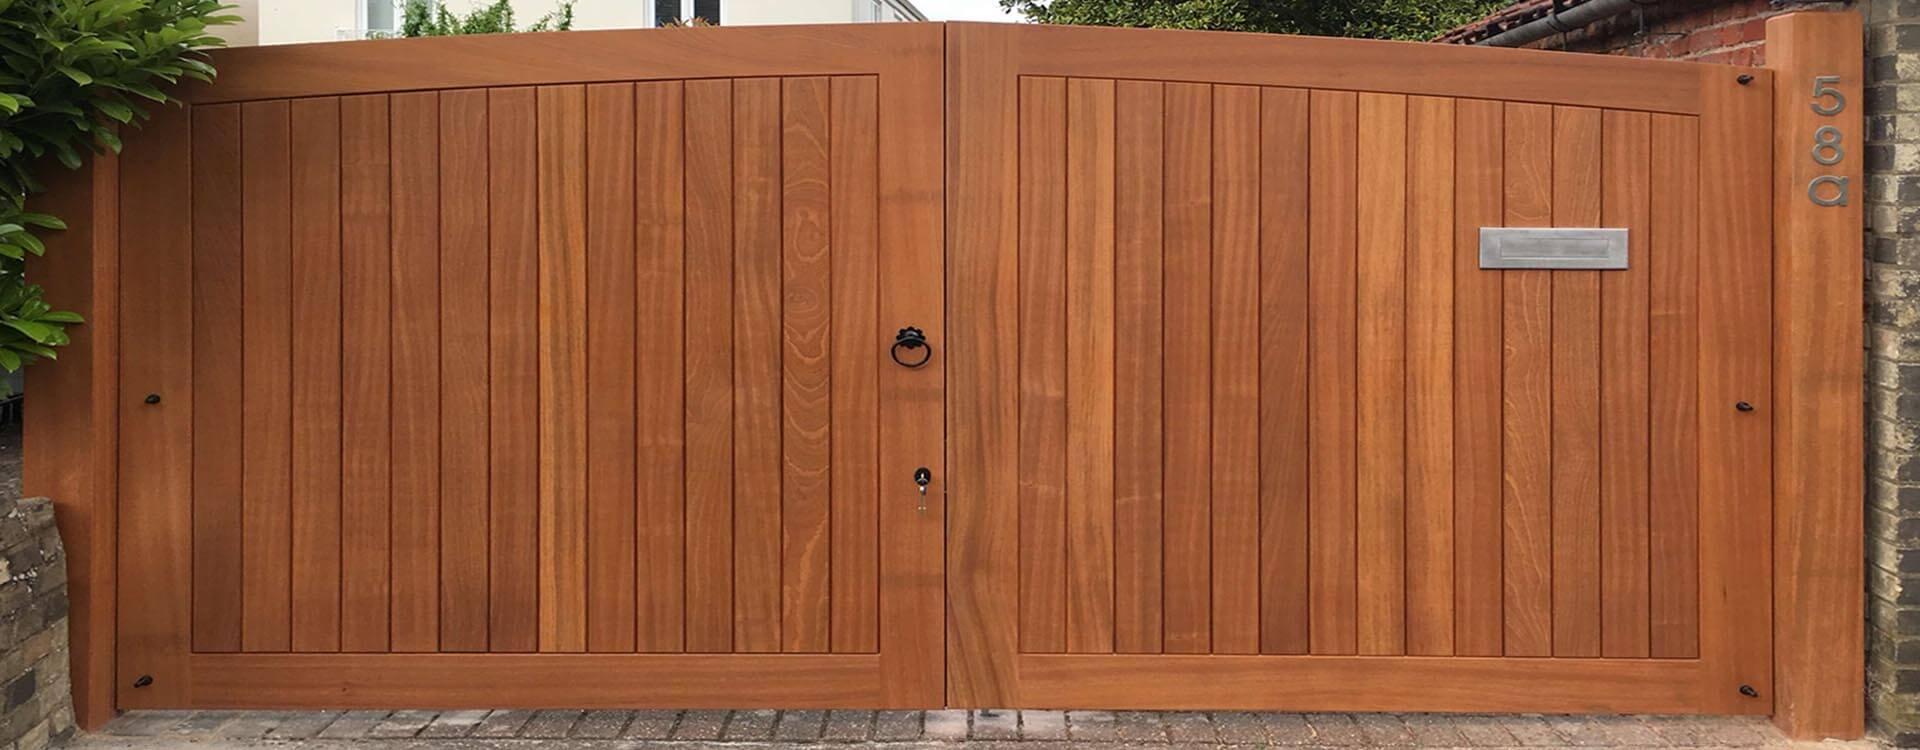 Solid Wooden Gates Norwich Carpenter